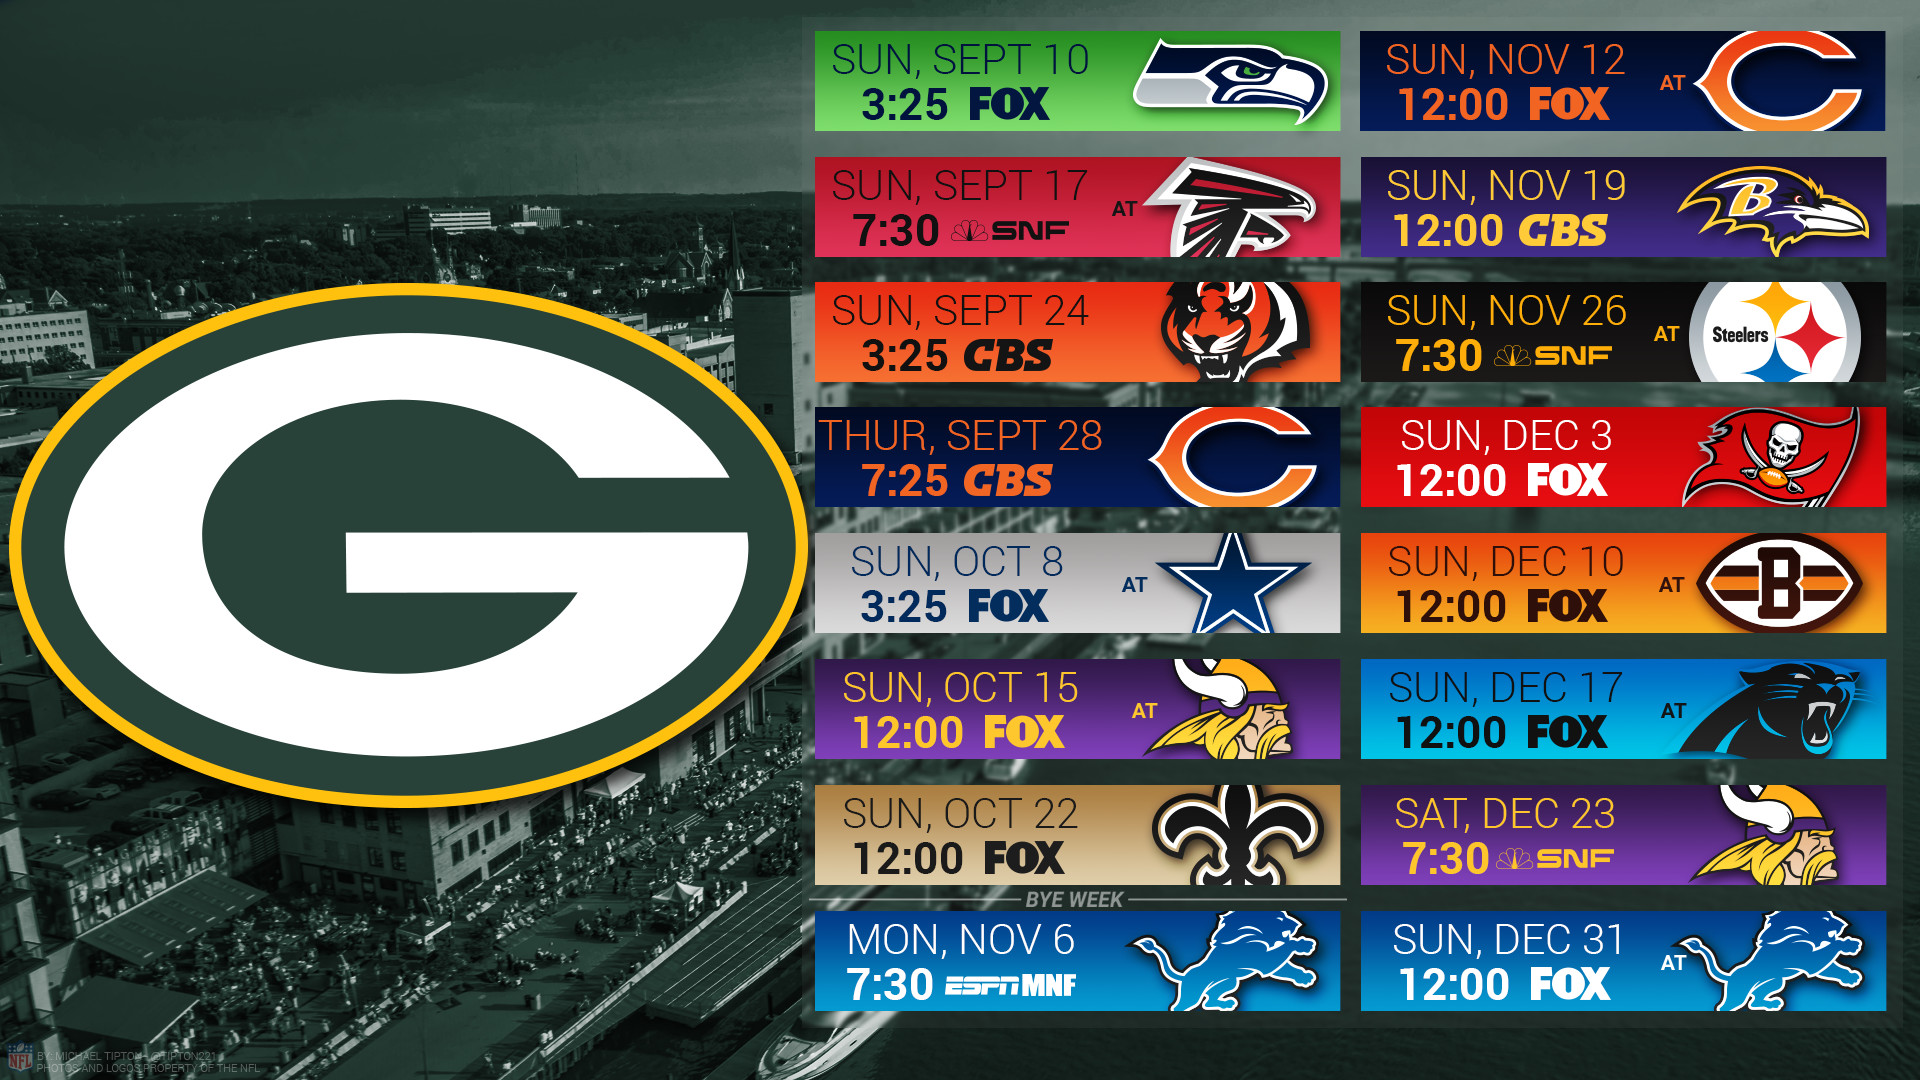 Green Bay Packers 2017 schedule city football logo wallpaper free pc desktop  computer …